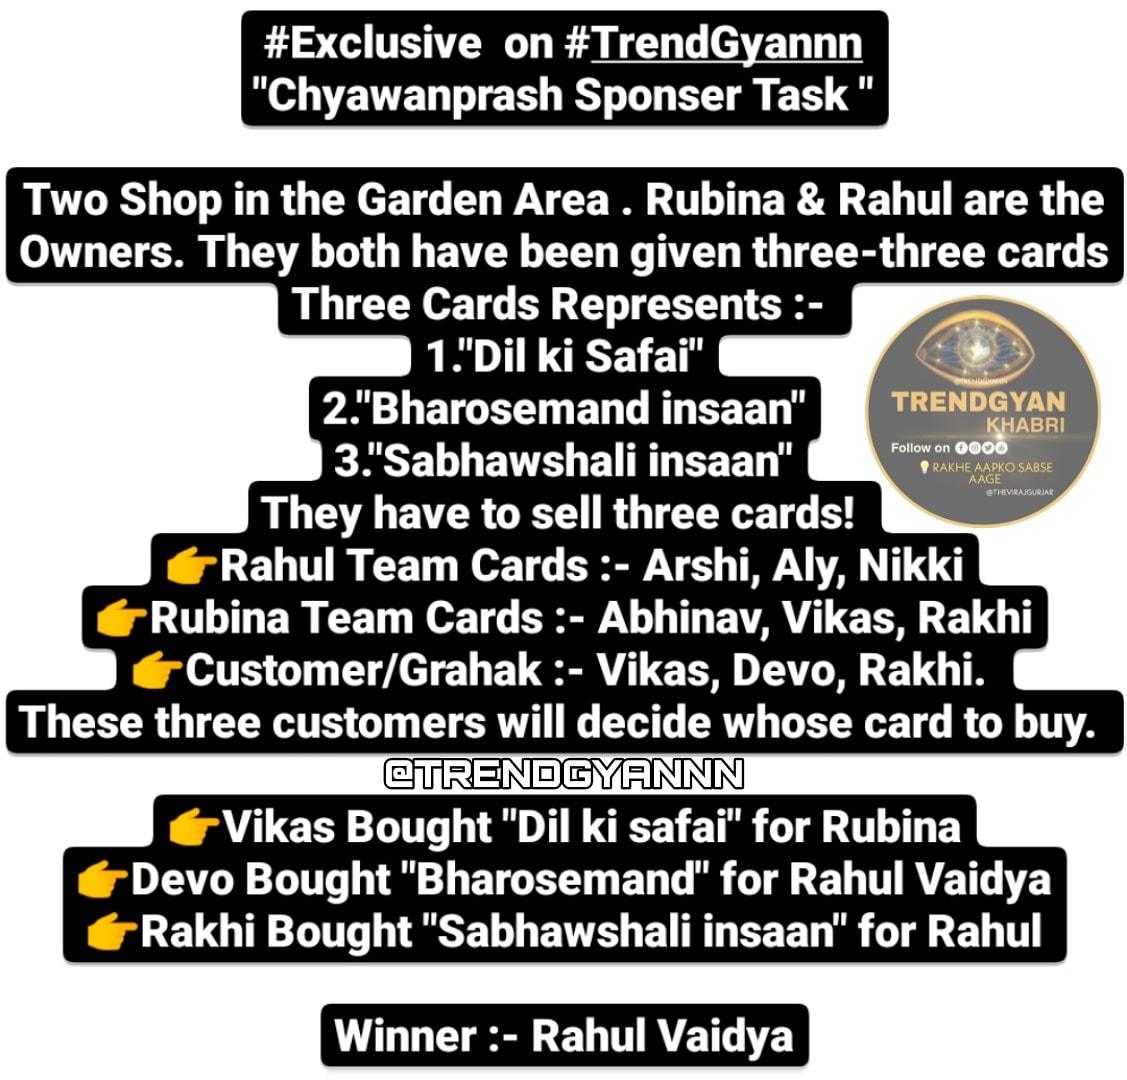 "Exclusive on #TrendGyan ""Chayawanprash sponsor task""  Winner - #RahulVaidya 🏆 #BiggBoss14 #BB14"